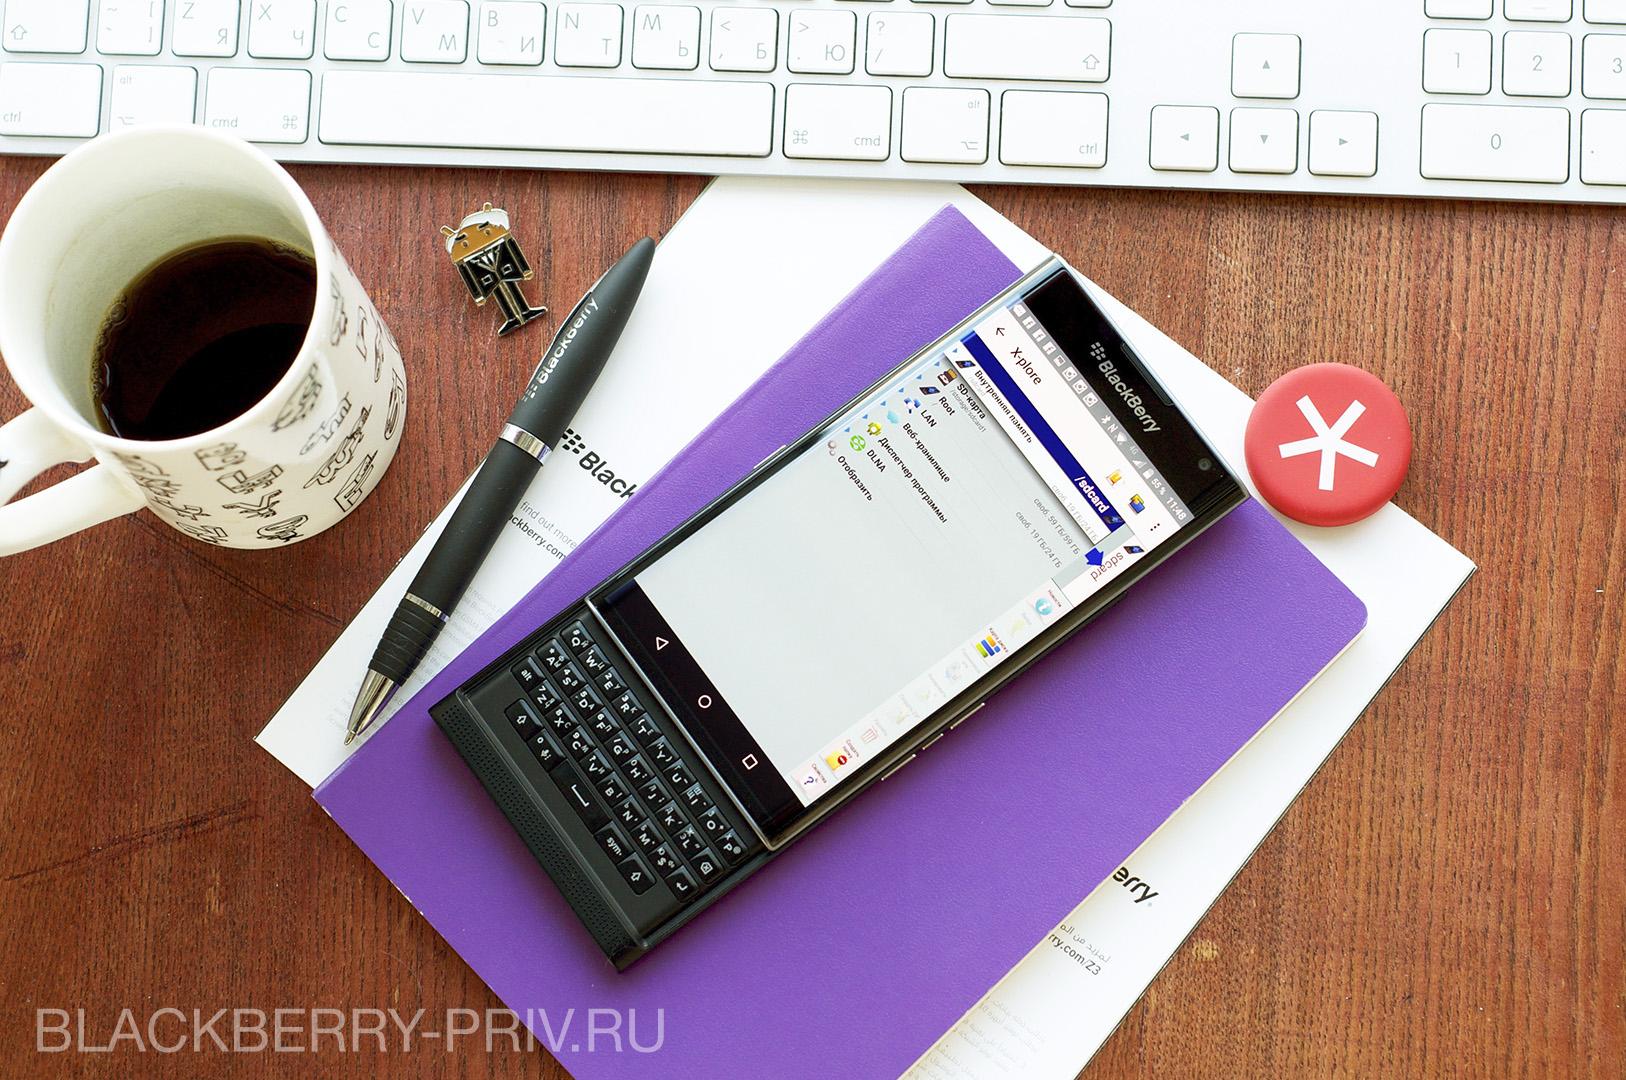 BlackBerry-PRIV-FM-07